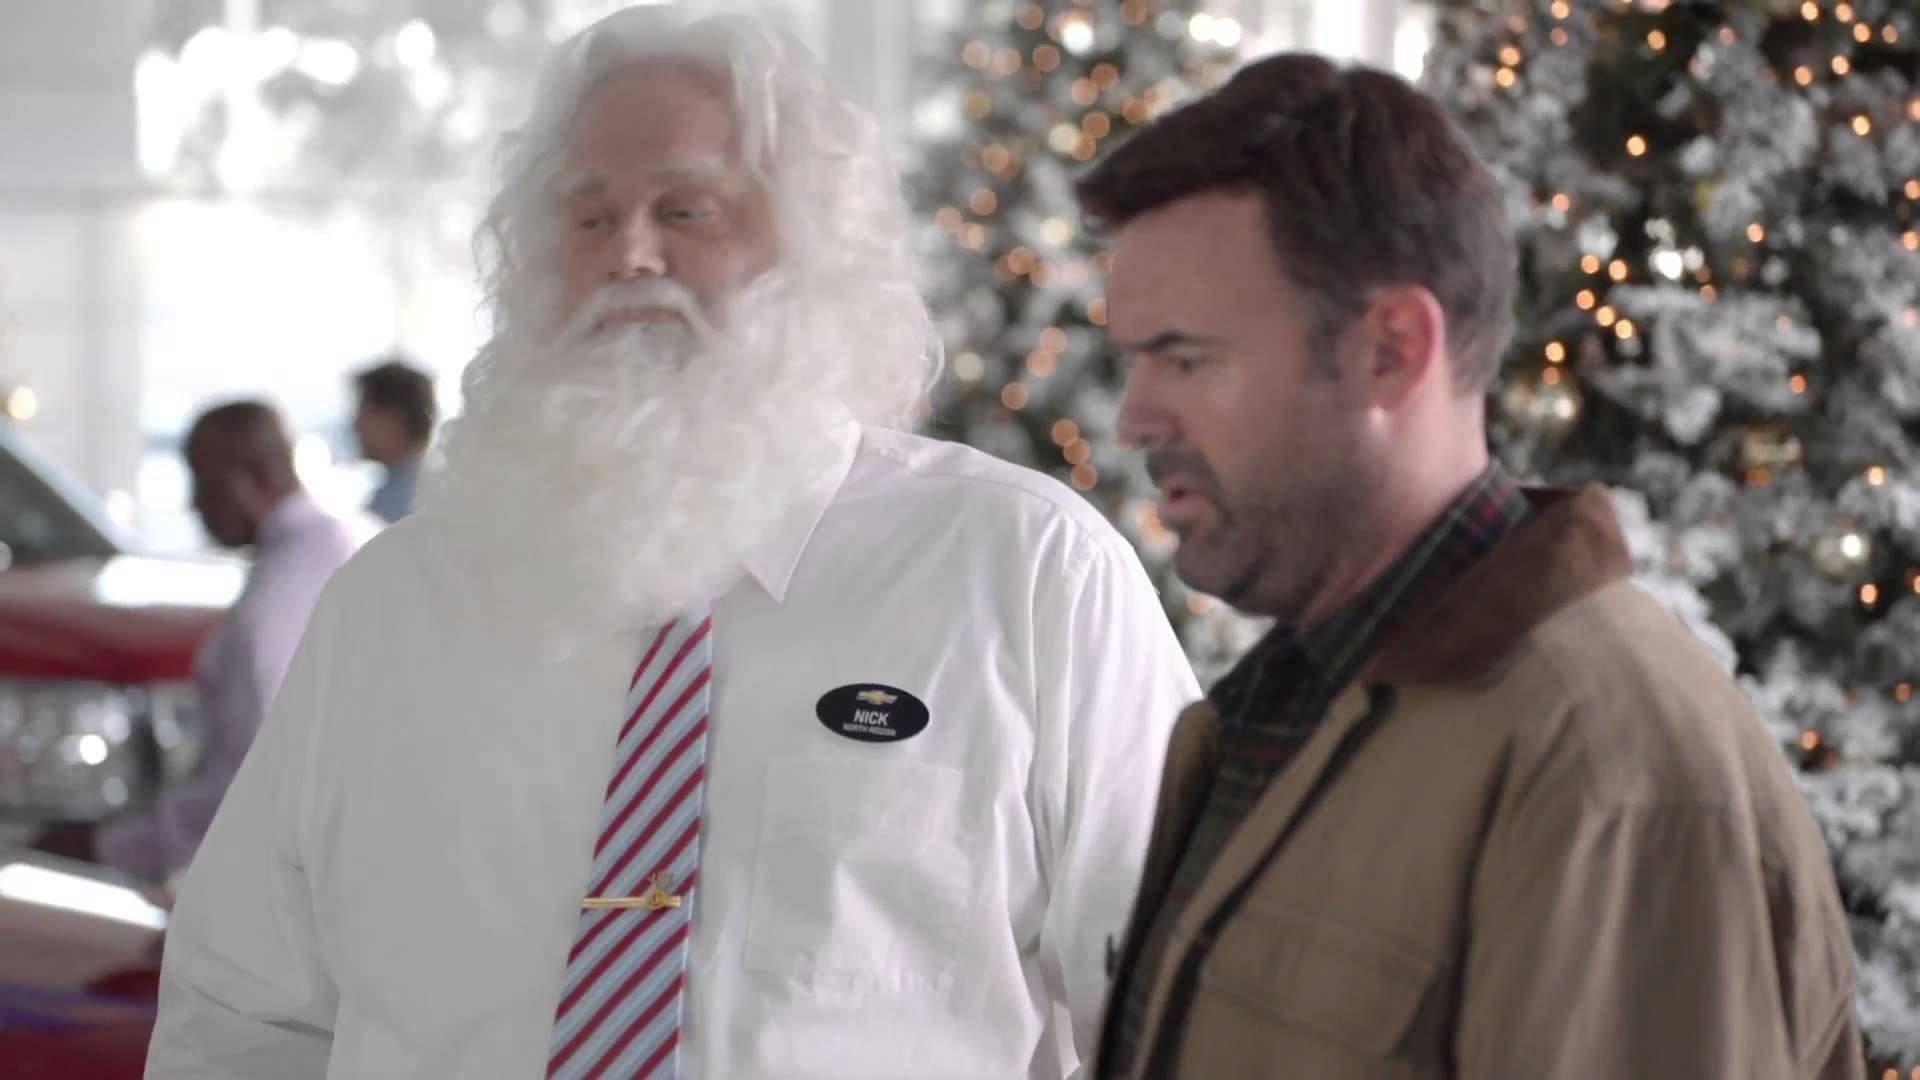 Chevrolet 2013 Christmas Funny Commercial Santa Claus